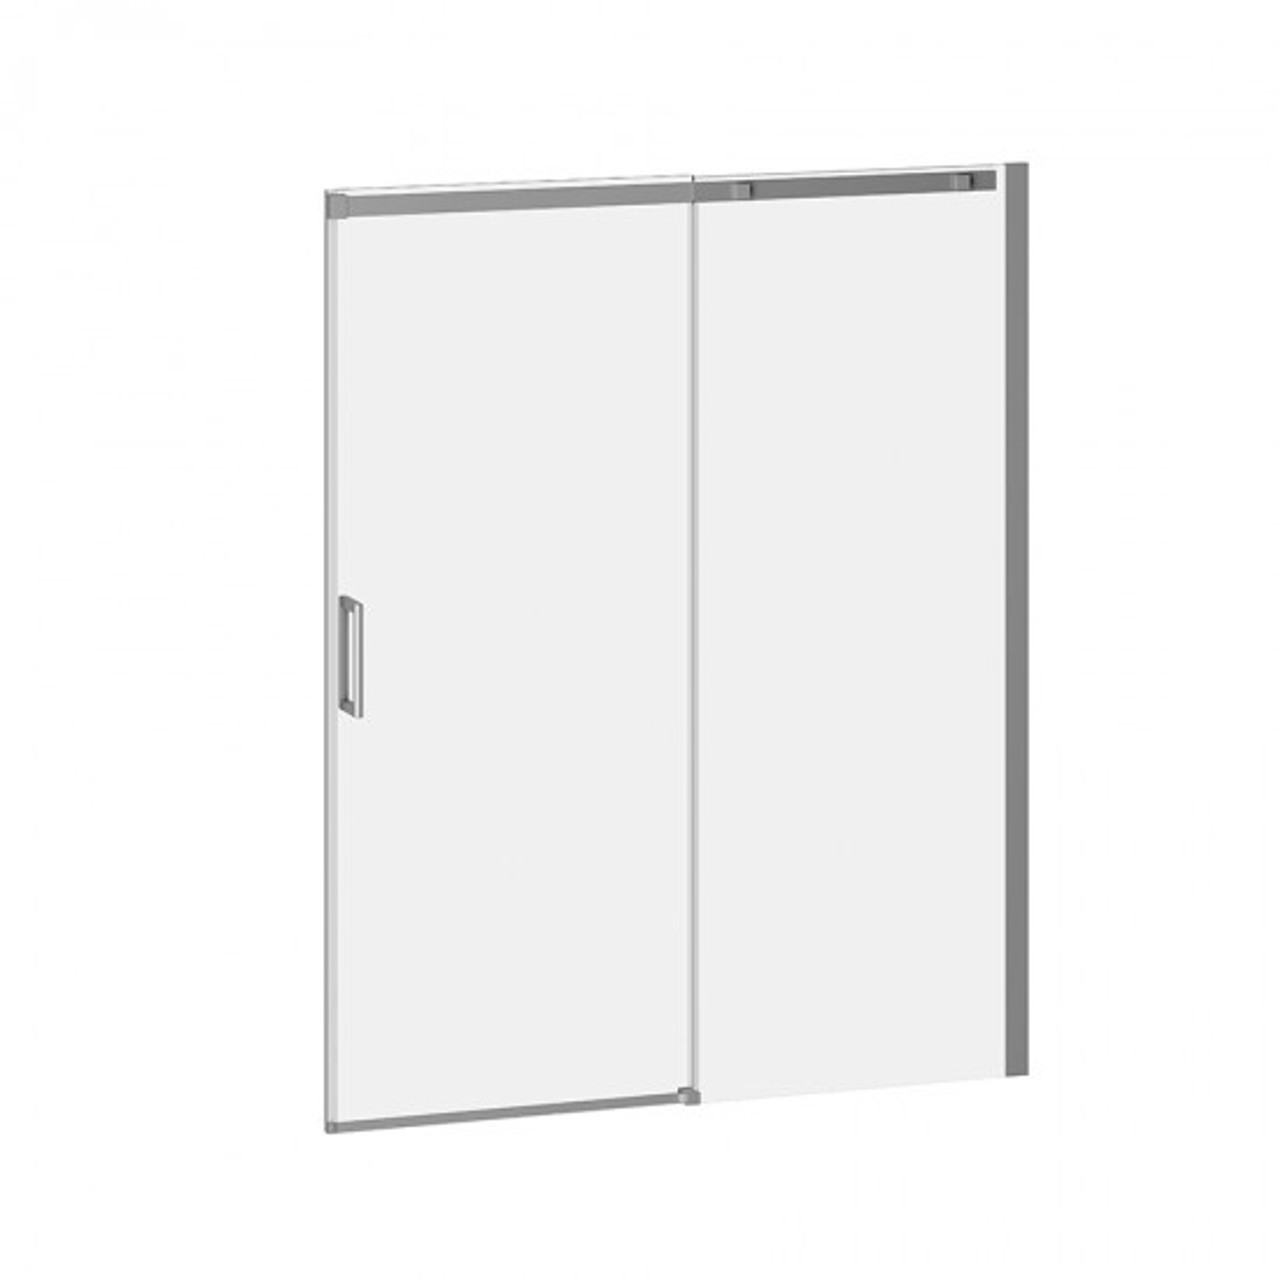 VIVIO DR1478 60\'\' X 75\'\' sliding shower door for alcove installation ...